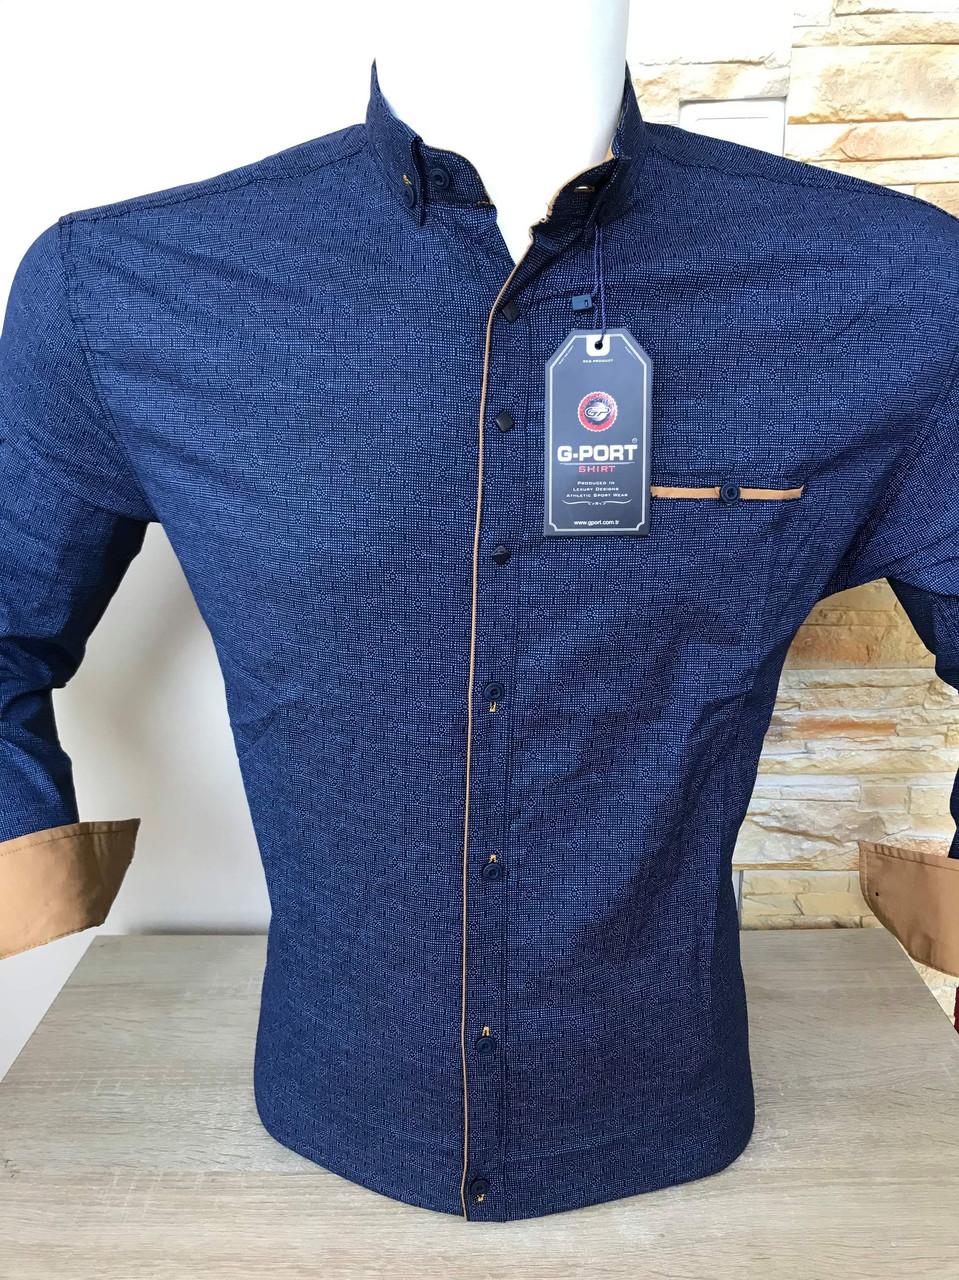 Приталена сорочка з довгим рукавом  G-Port*680 з принтом